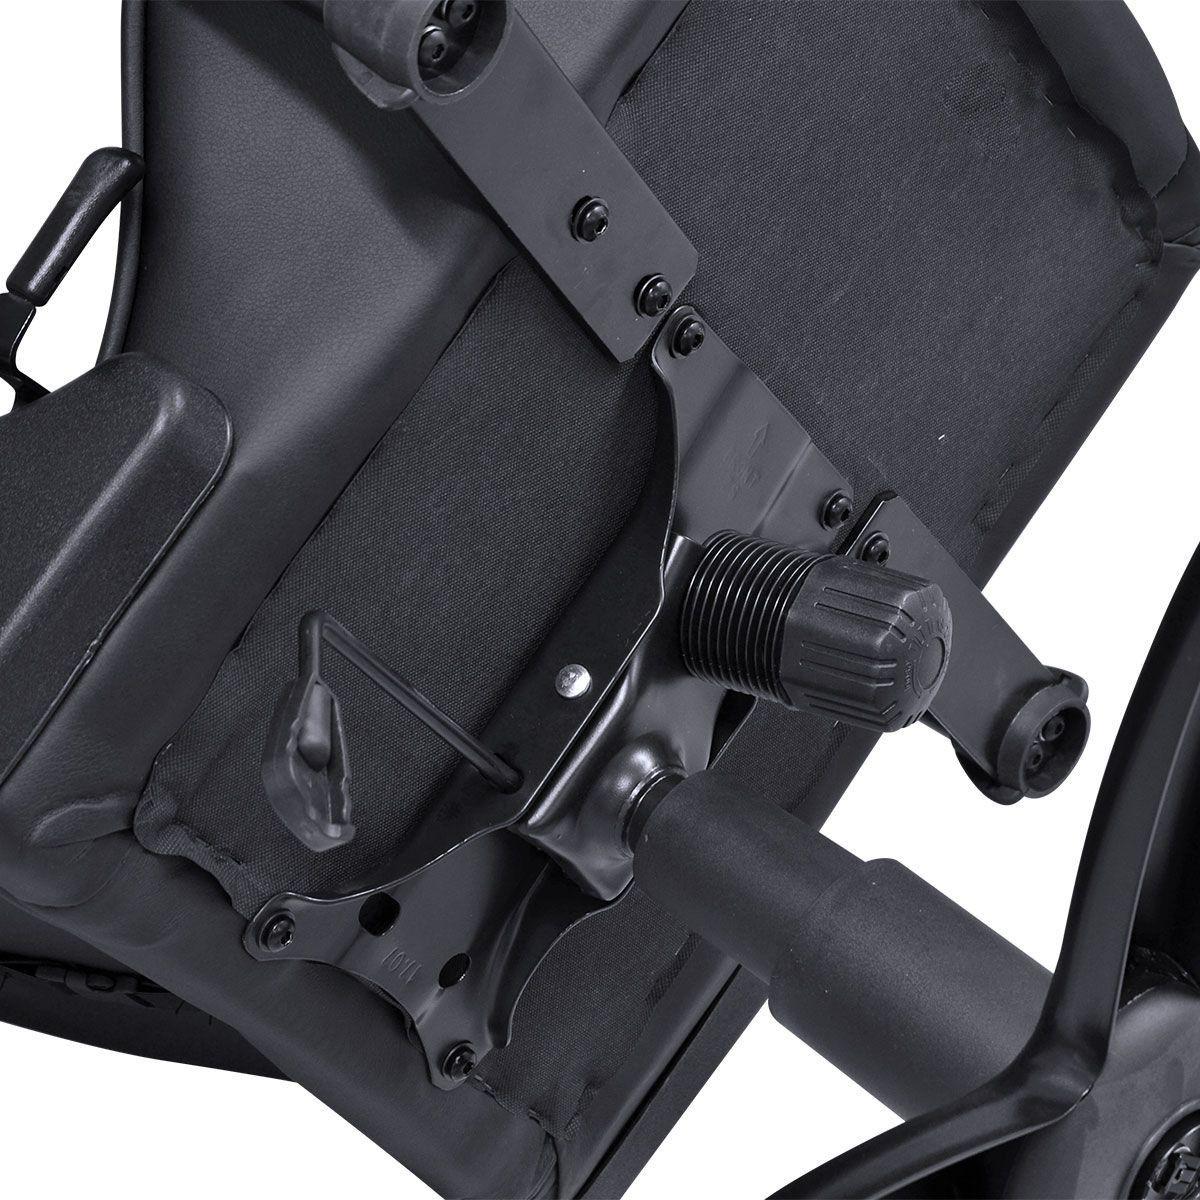 Cadeira Gamer Mad Racer V8 Preto MADV8PTGL - Pcyes